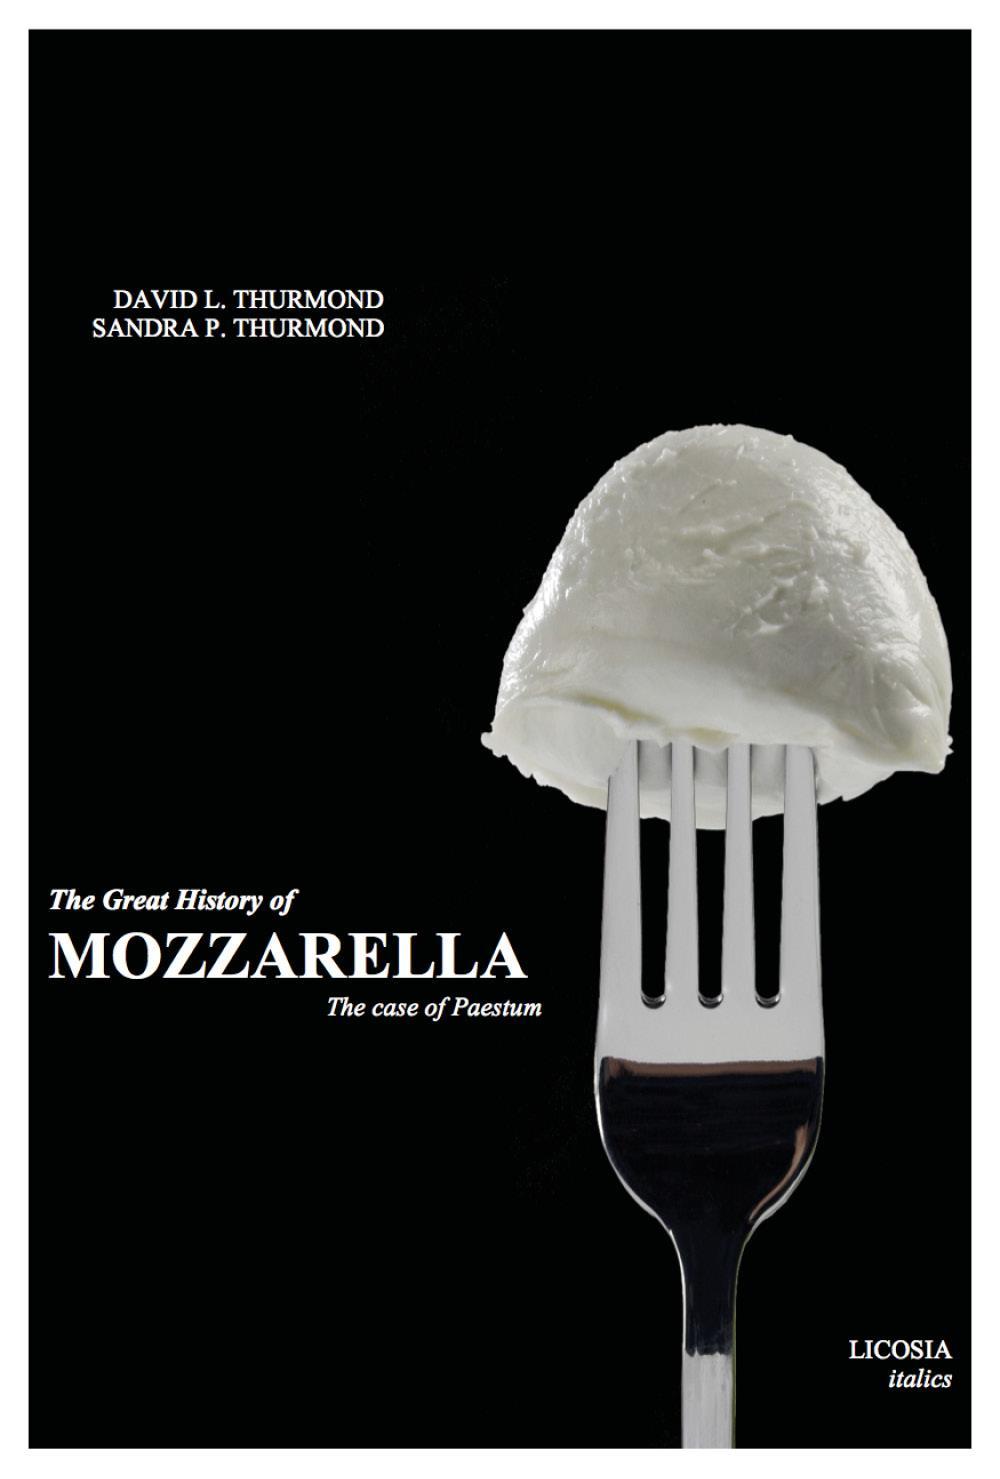 The Great History of Mozzarella